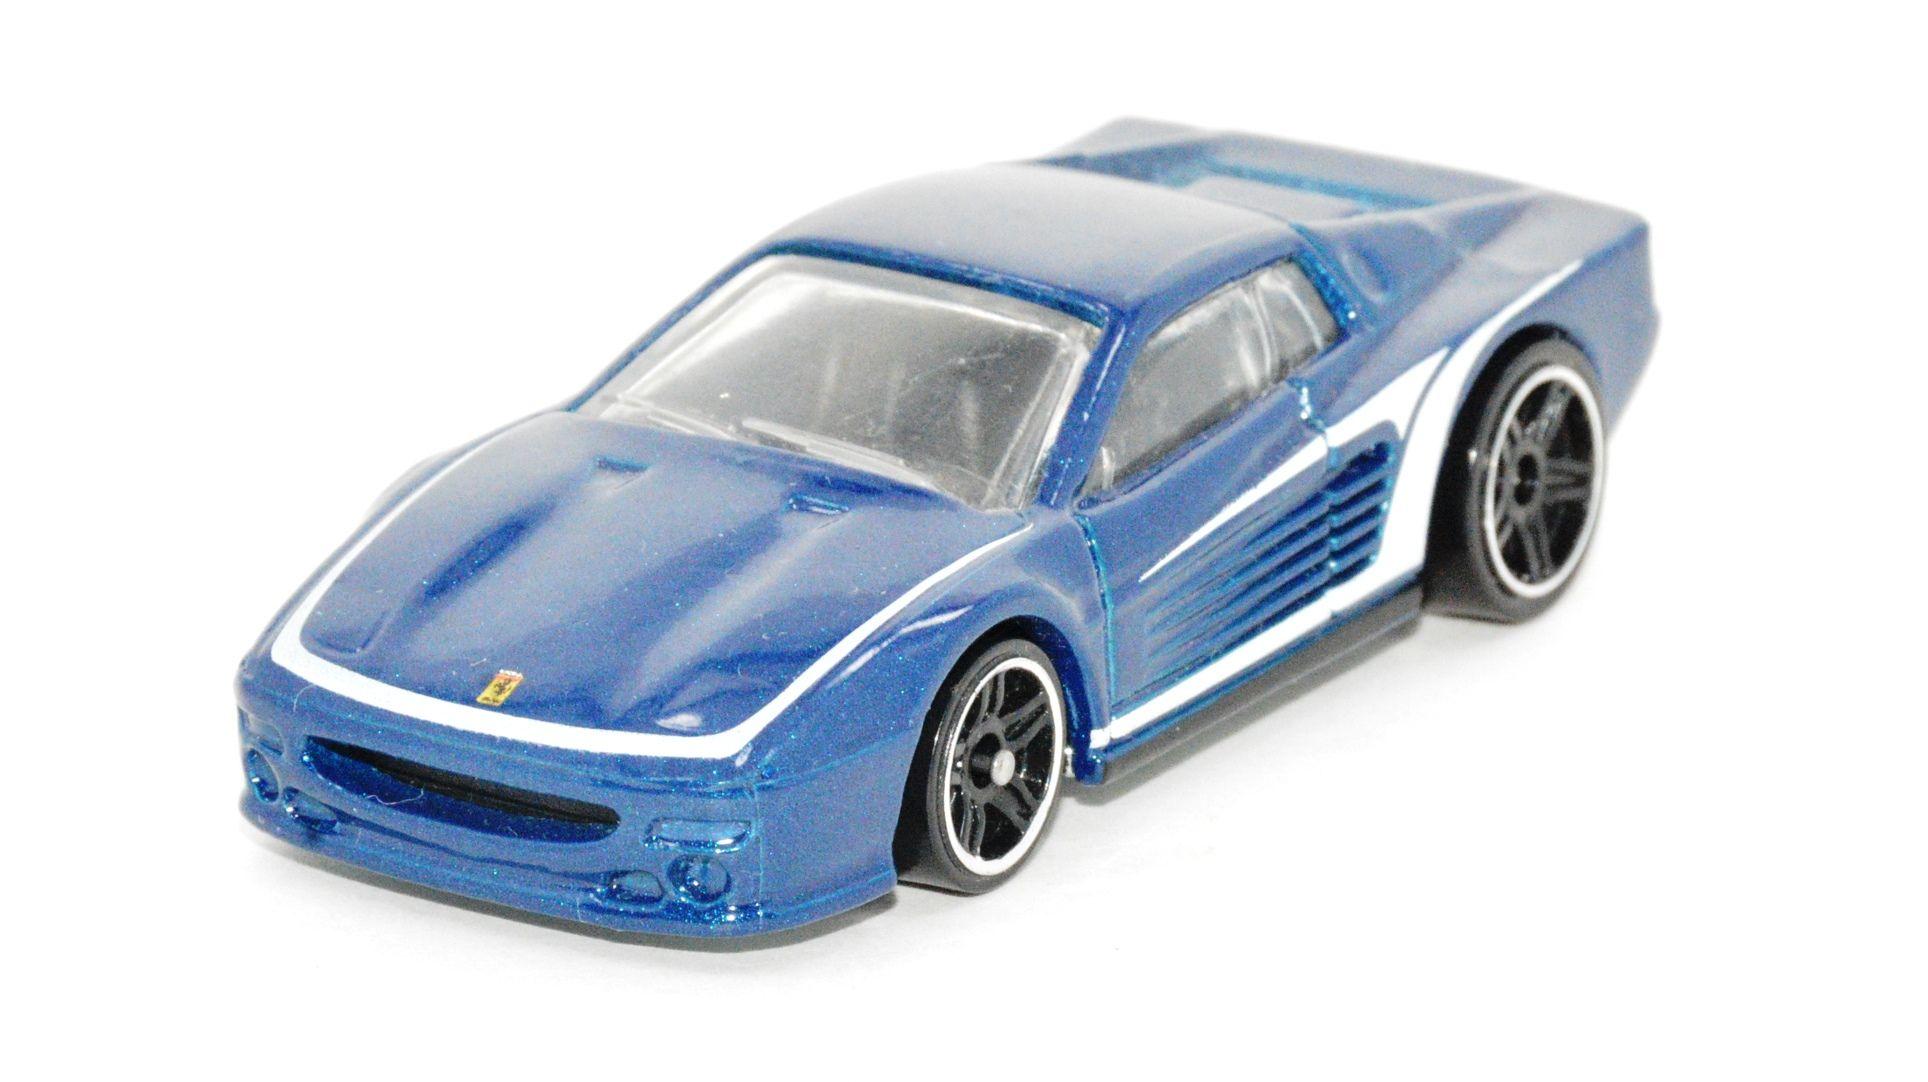 All Ferrari Models List Of Ferrari Cars Vehicles Ranker >> Hot Wheels Ferrari F512m Ferrari Hot Wheels Ferrari Hot